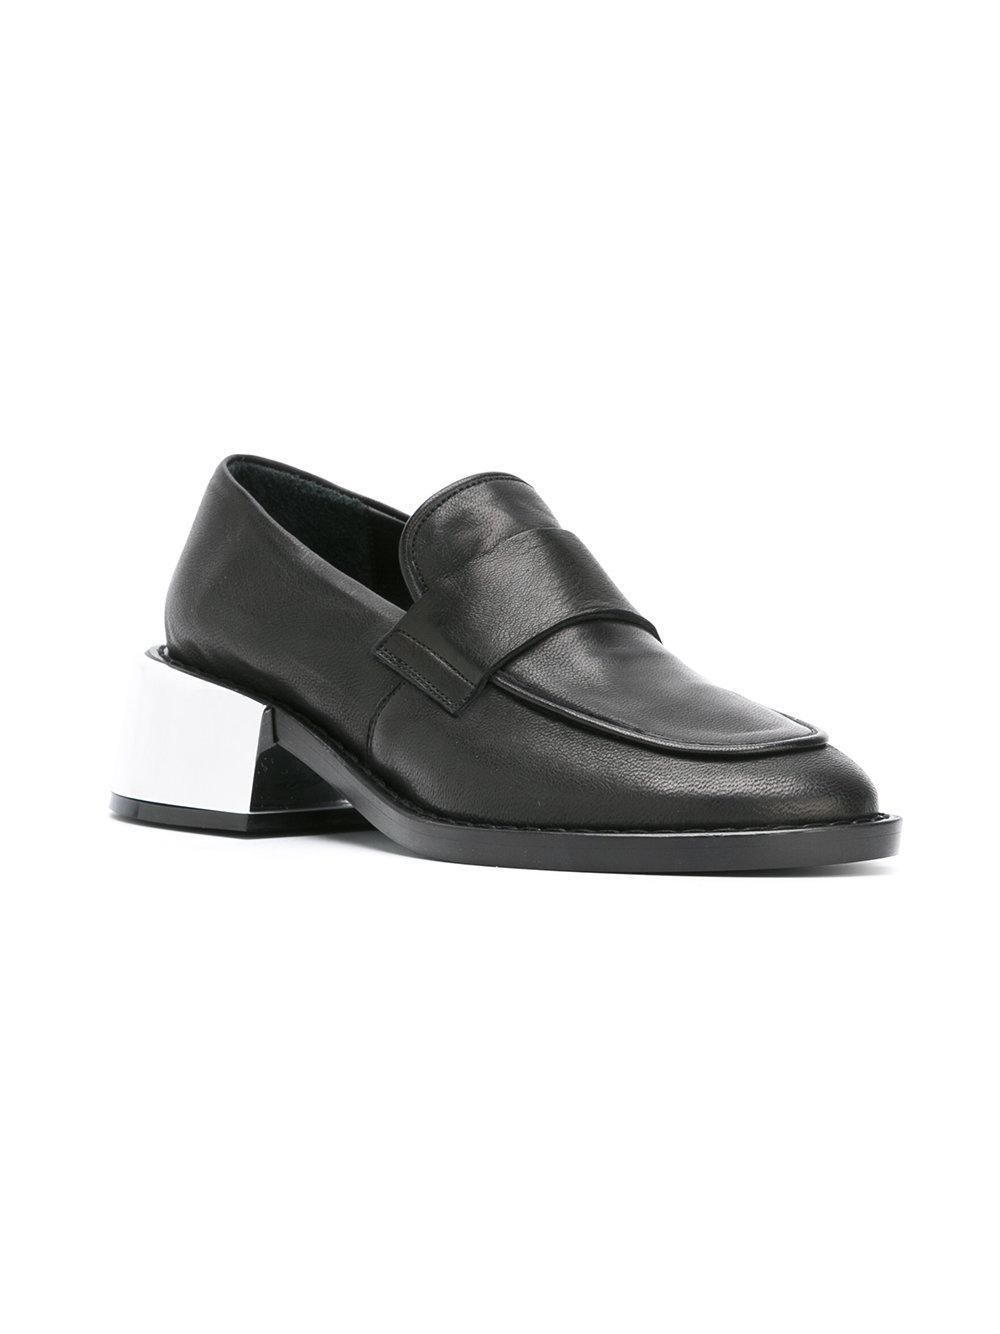 MM6 Maison Martin Margiela Black Audrey Heels ha0I6LWBC